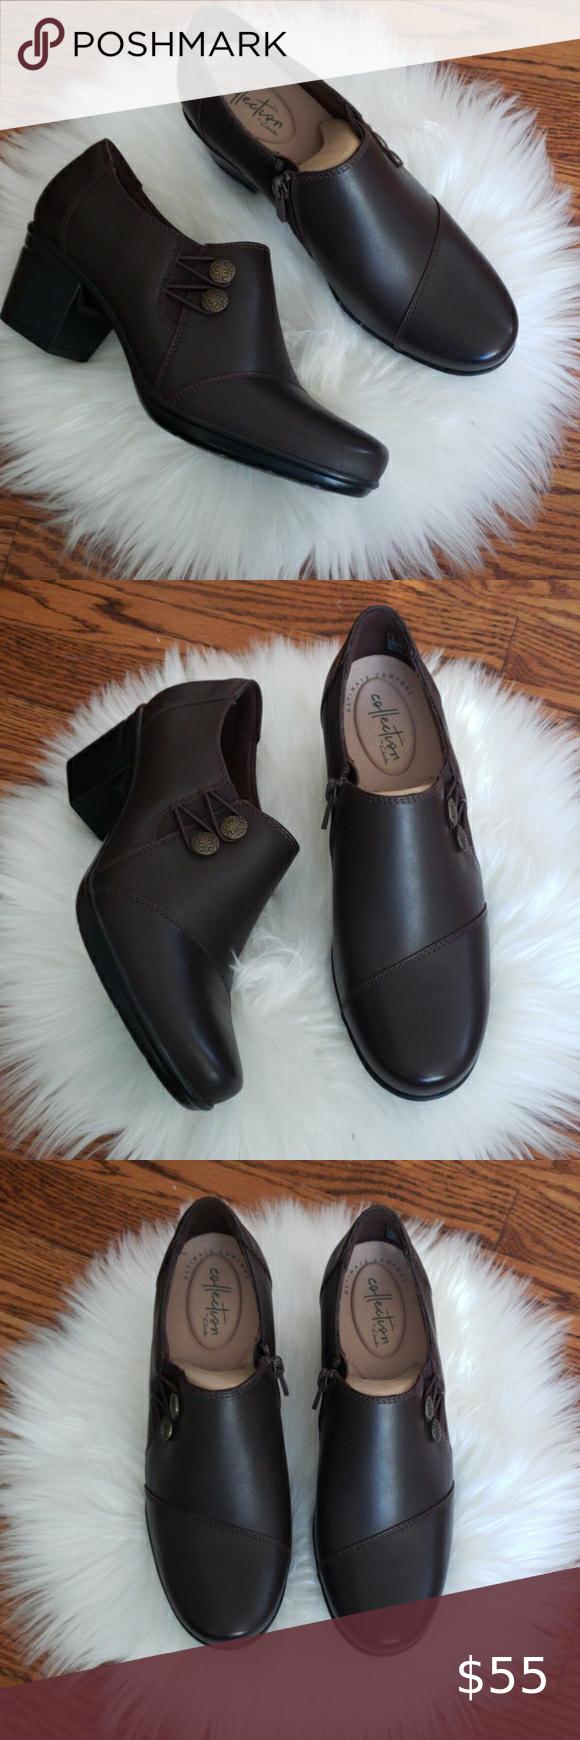 Clark's Emslie Warren dark brown slip on loafers Leather  Imported  Rubber sole  Heel measures approximately 2